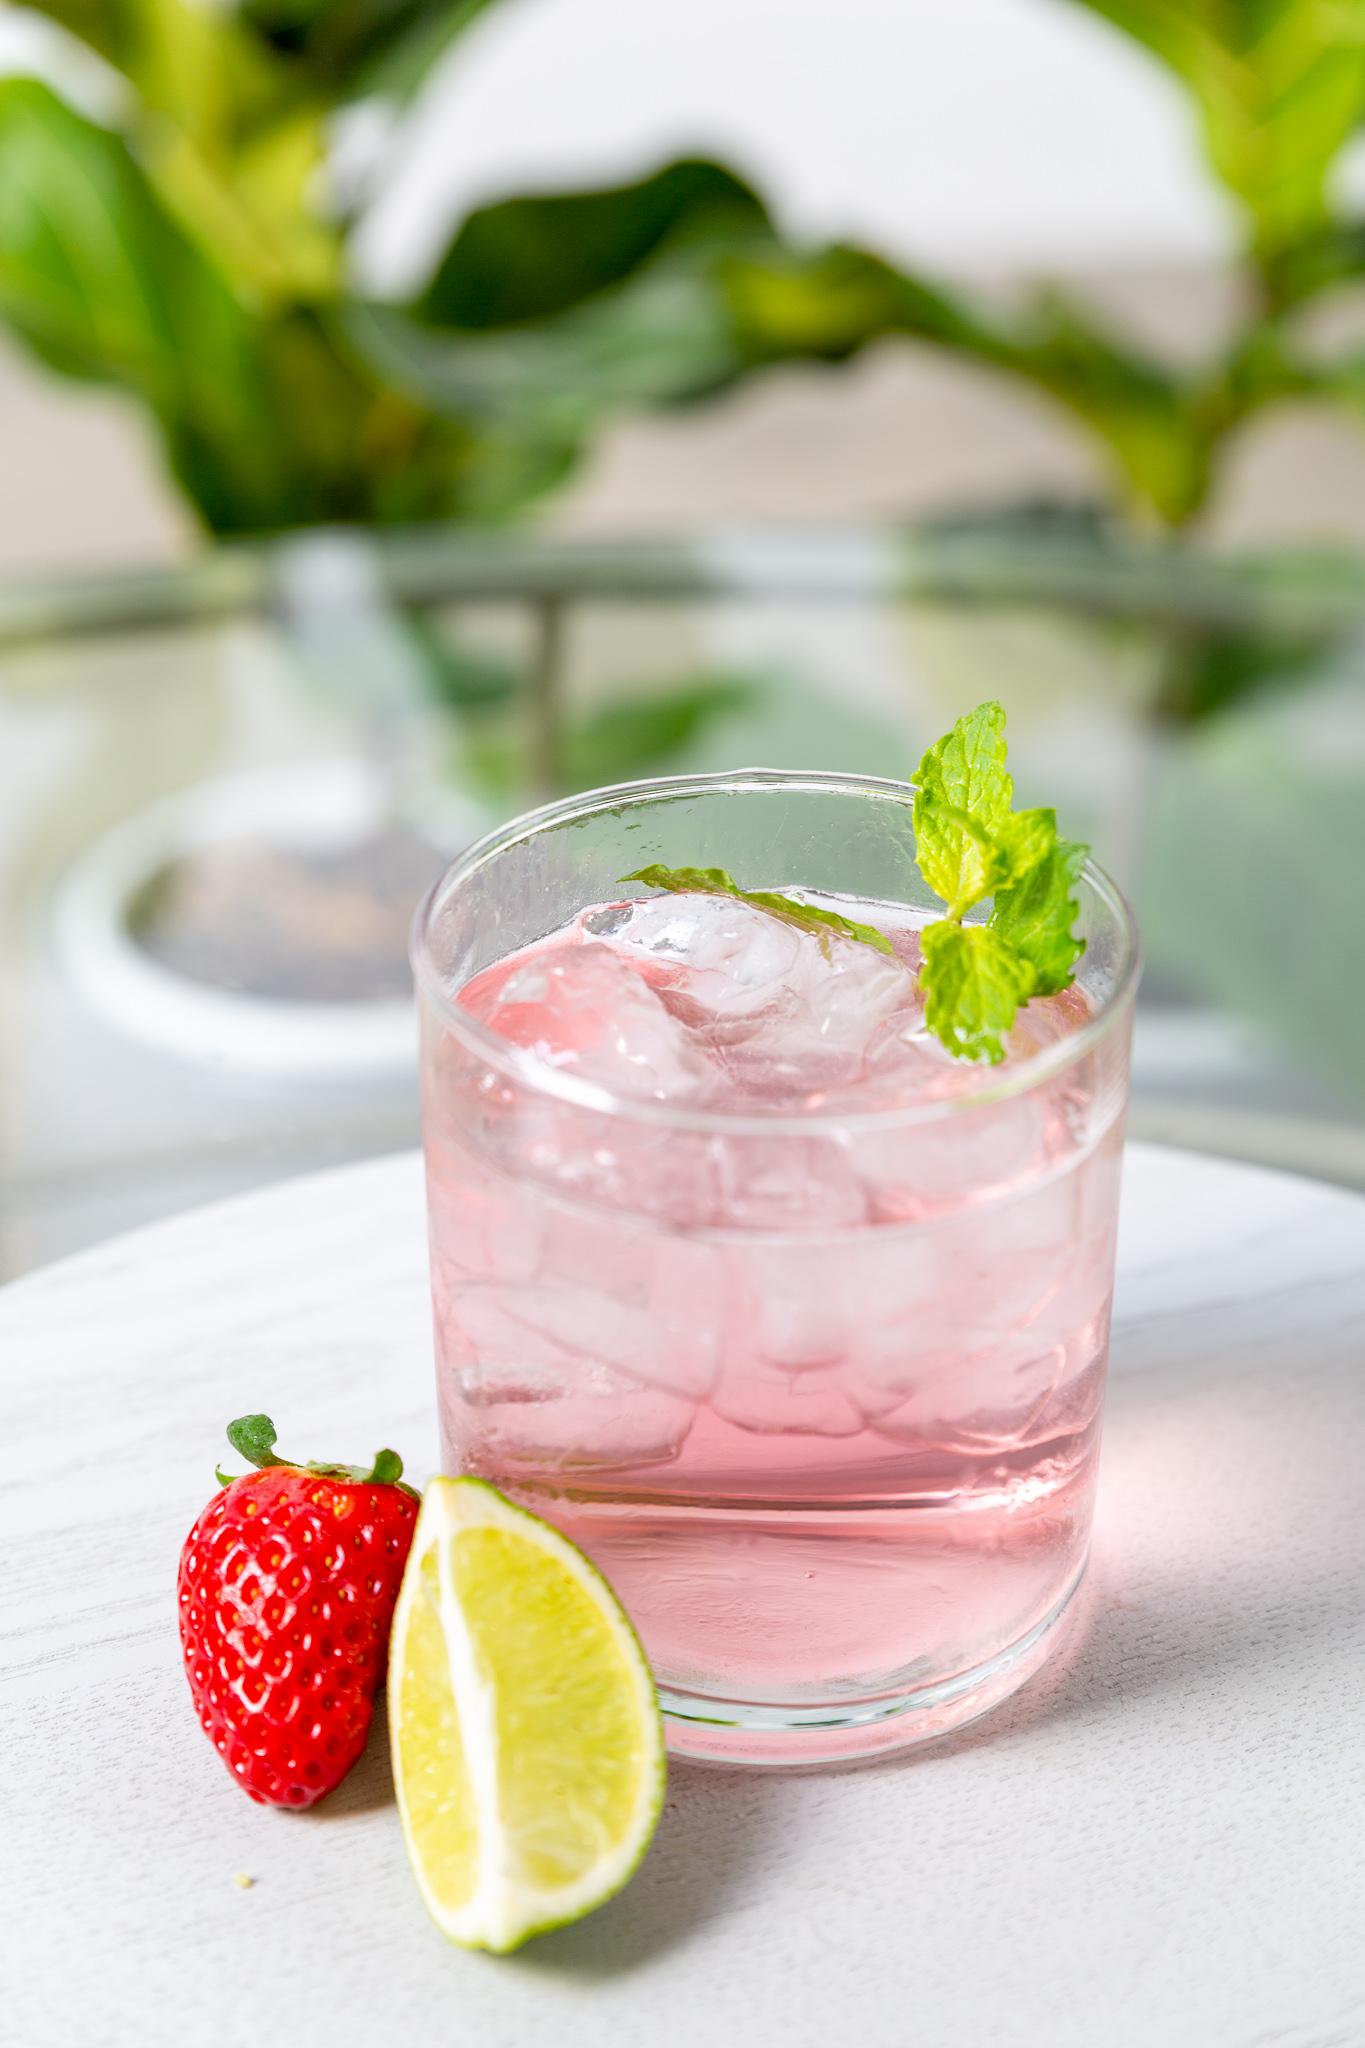 Fat Pixie Watermelon Cider In Glass